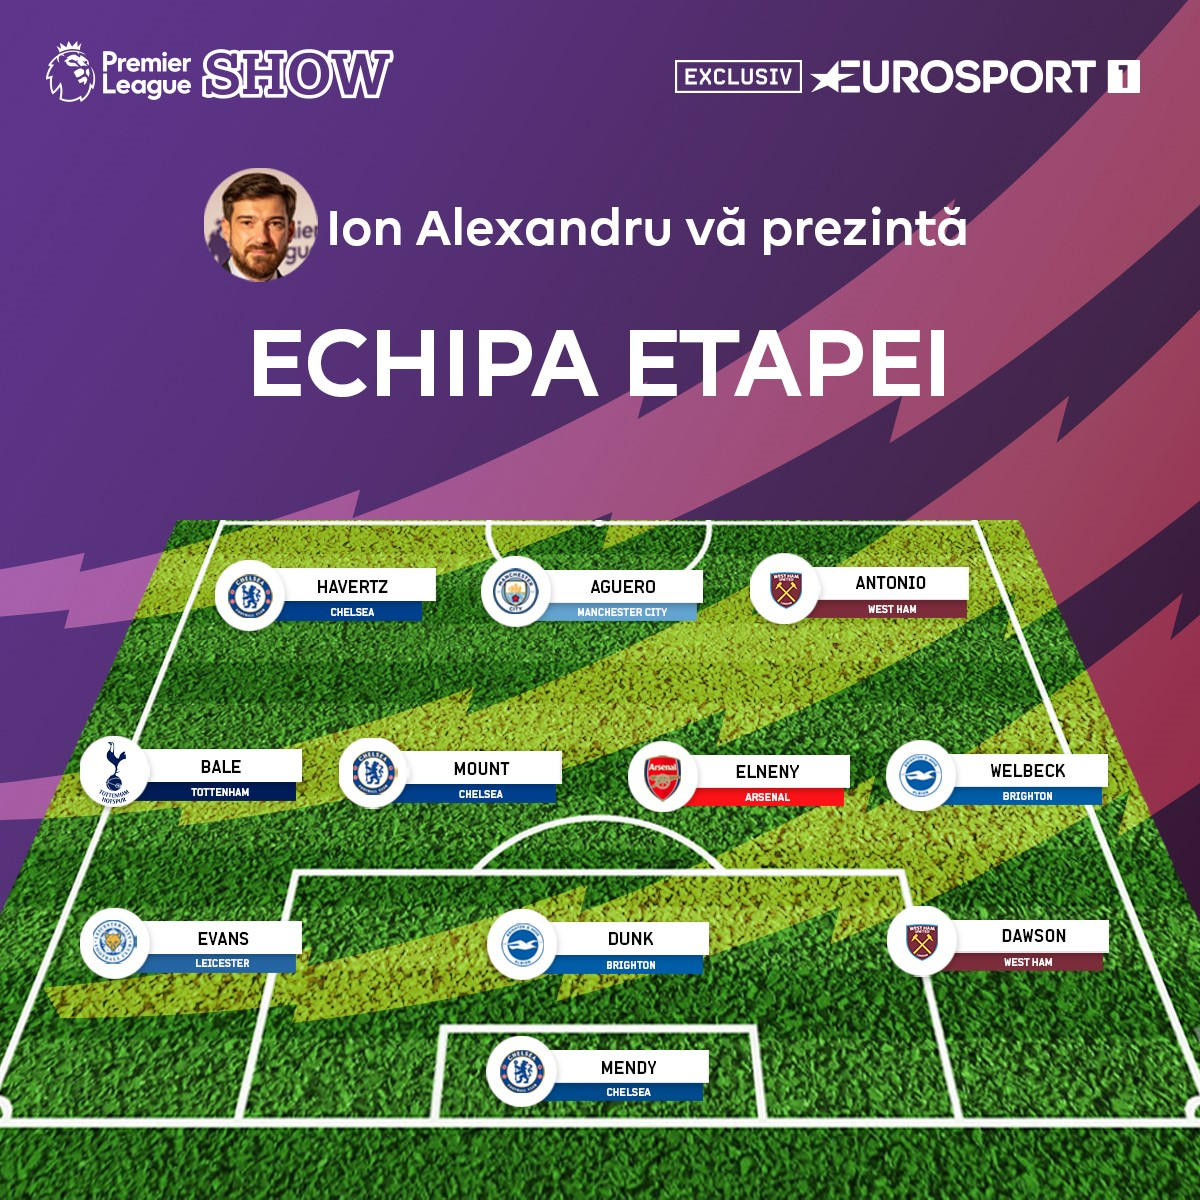 https://i.eurosport.com/2021/05/04/3126047.jpg